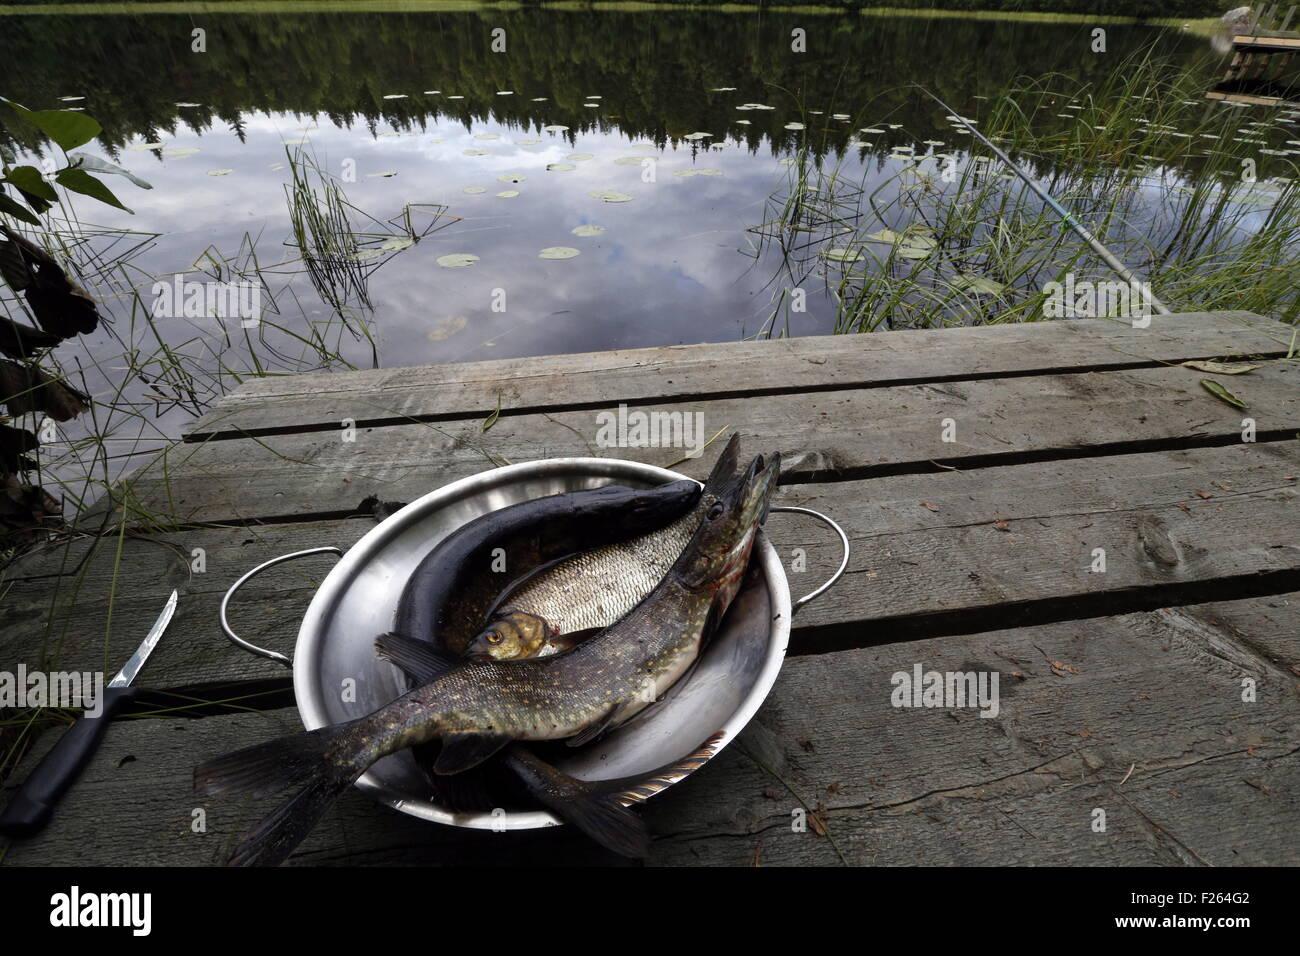 Savonlinna, Finland. 30th July, 2015. A fish catch. © Valery Matytsin/TASS/Alamy Live News - Stock Image